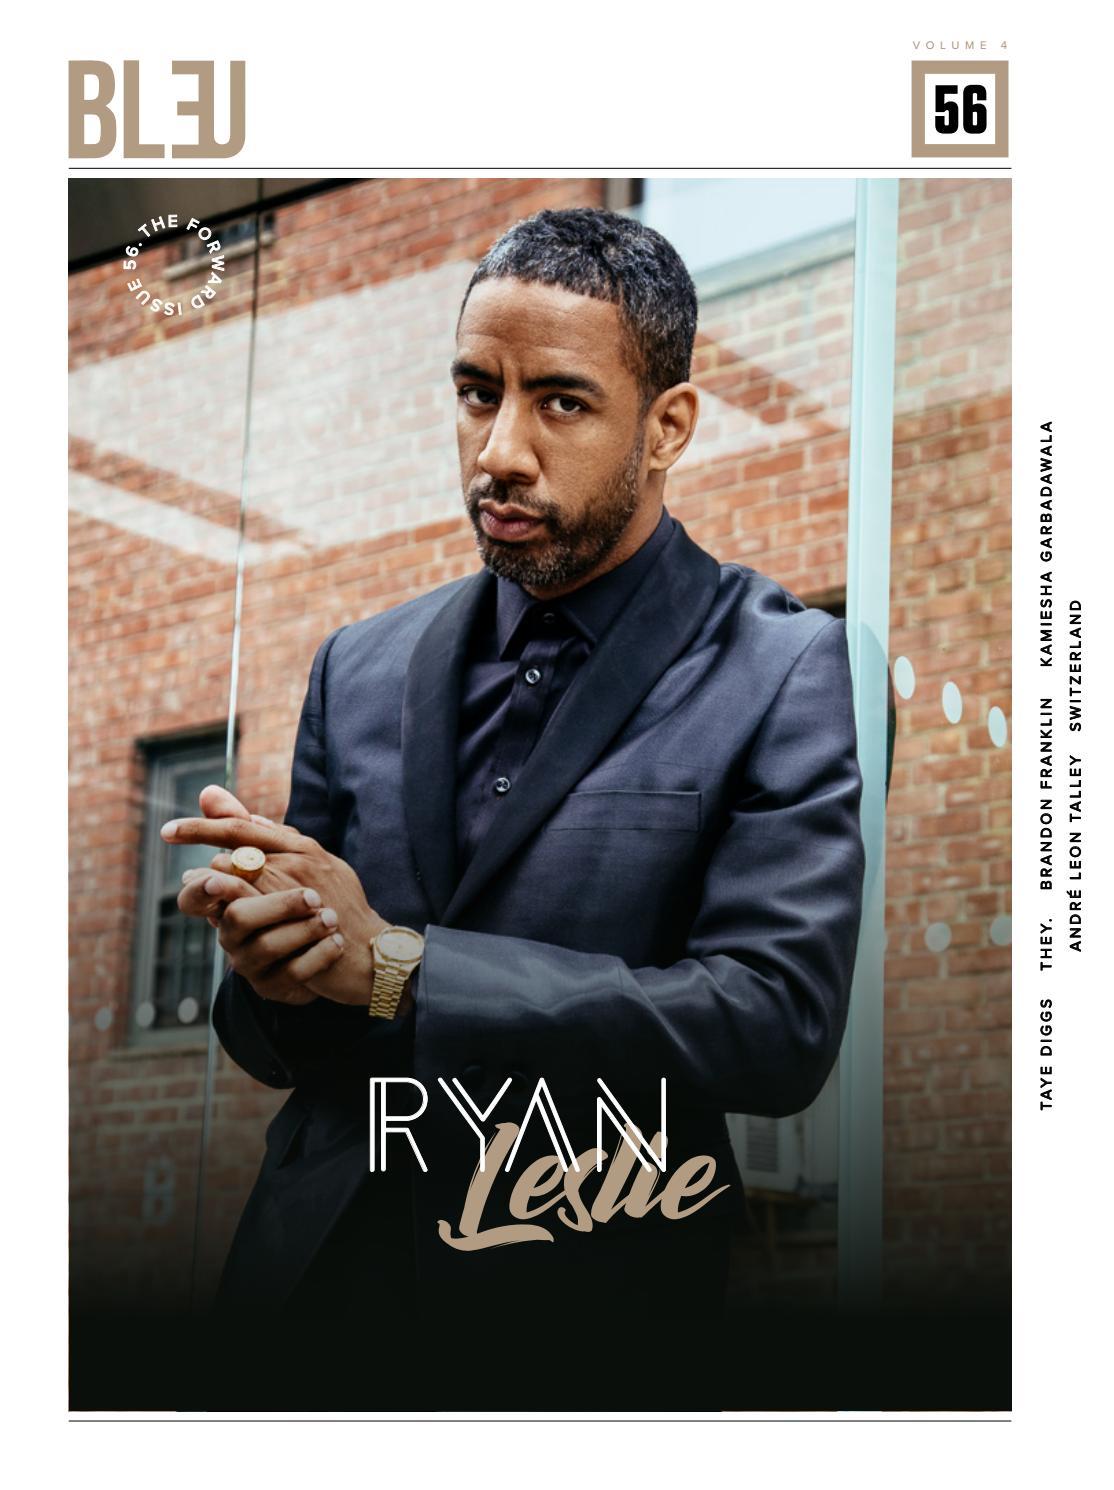 Bleu Magazine Issue 56 - Ryan Leslie by Bleu Magazine - issuu